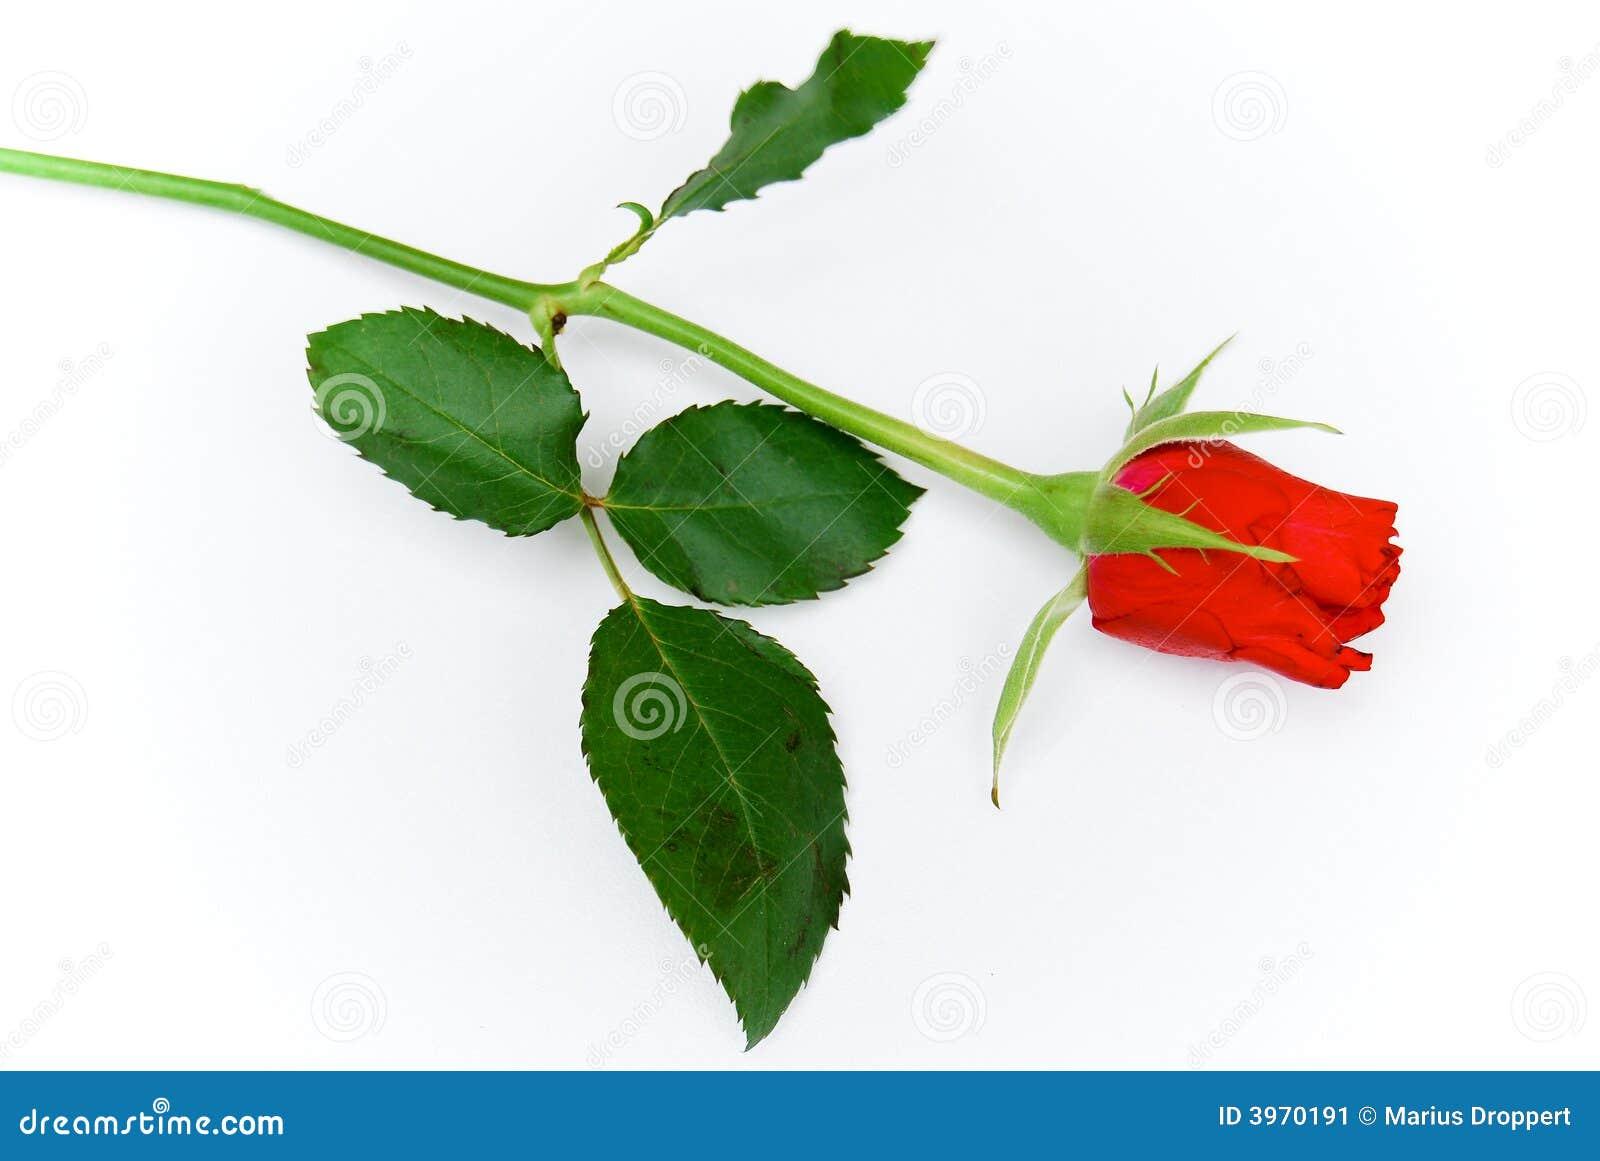 Cose玫瑰总额